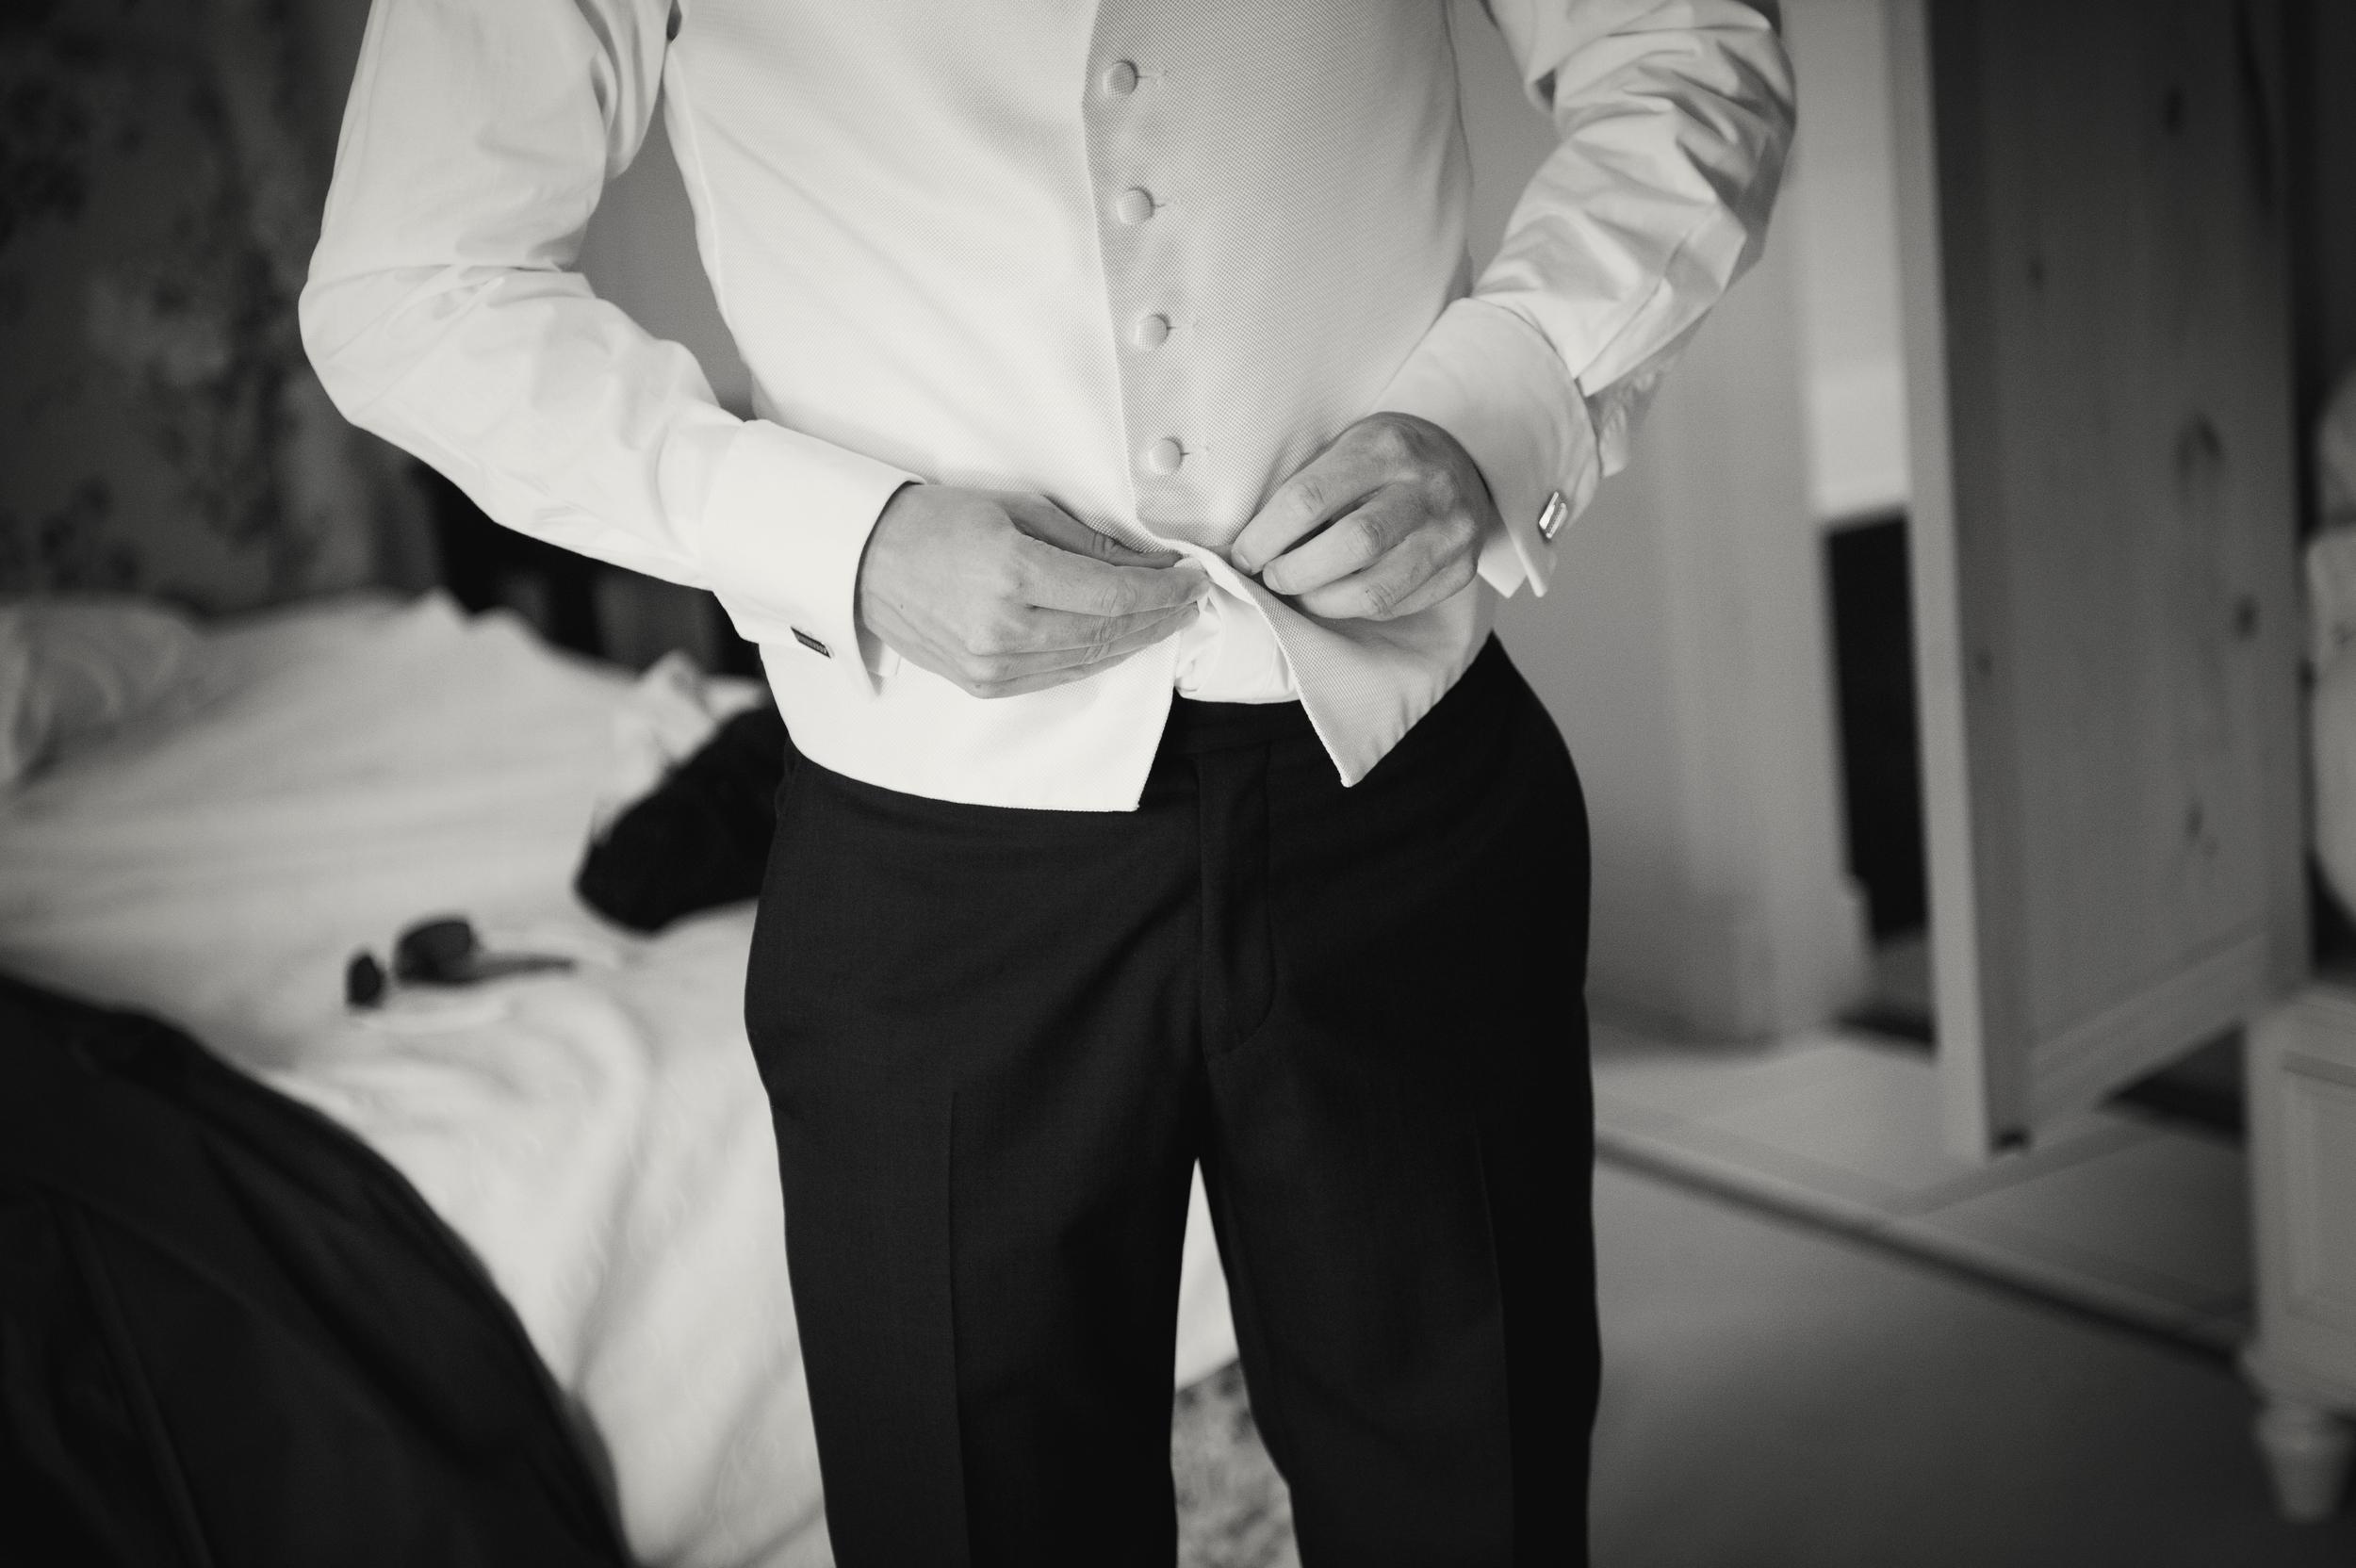 Suit by Tom Murphy's, Cork -Photography:Weddings by KARA  © - Wedding Location: Kilshane House, Tipperary, Ireland